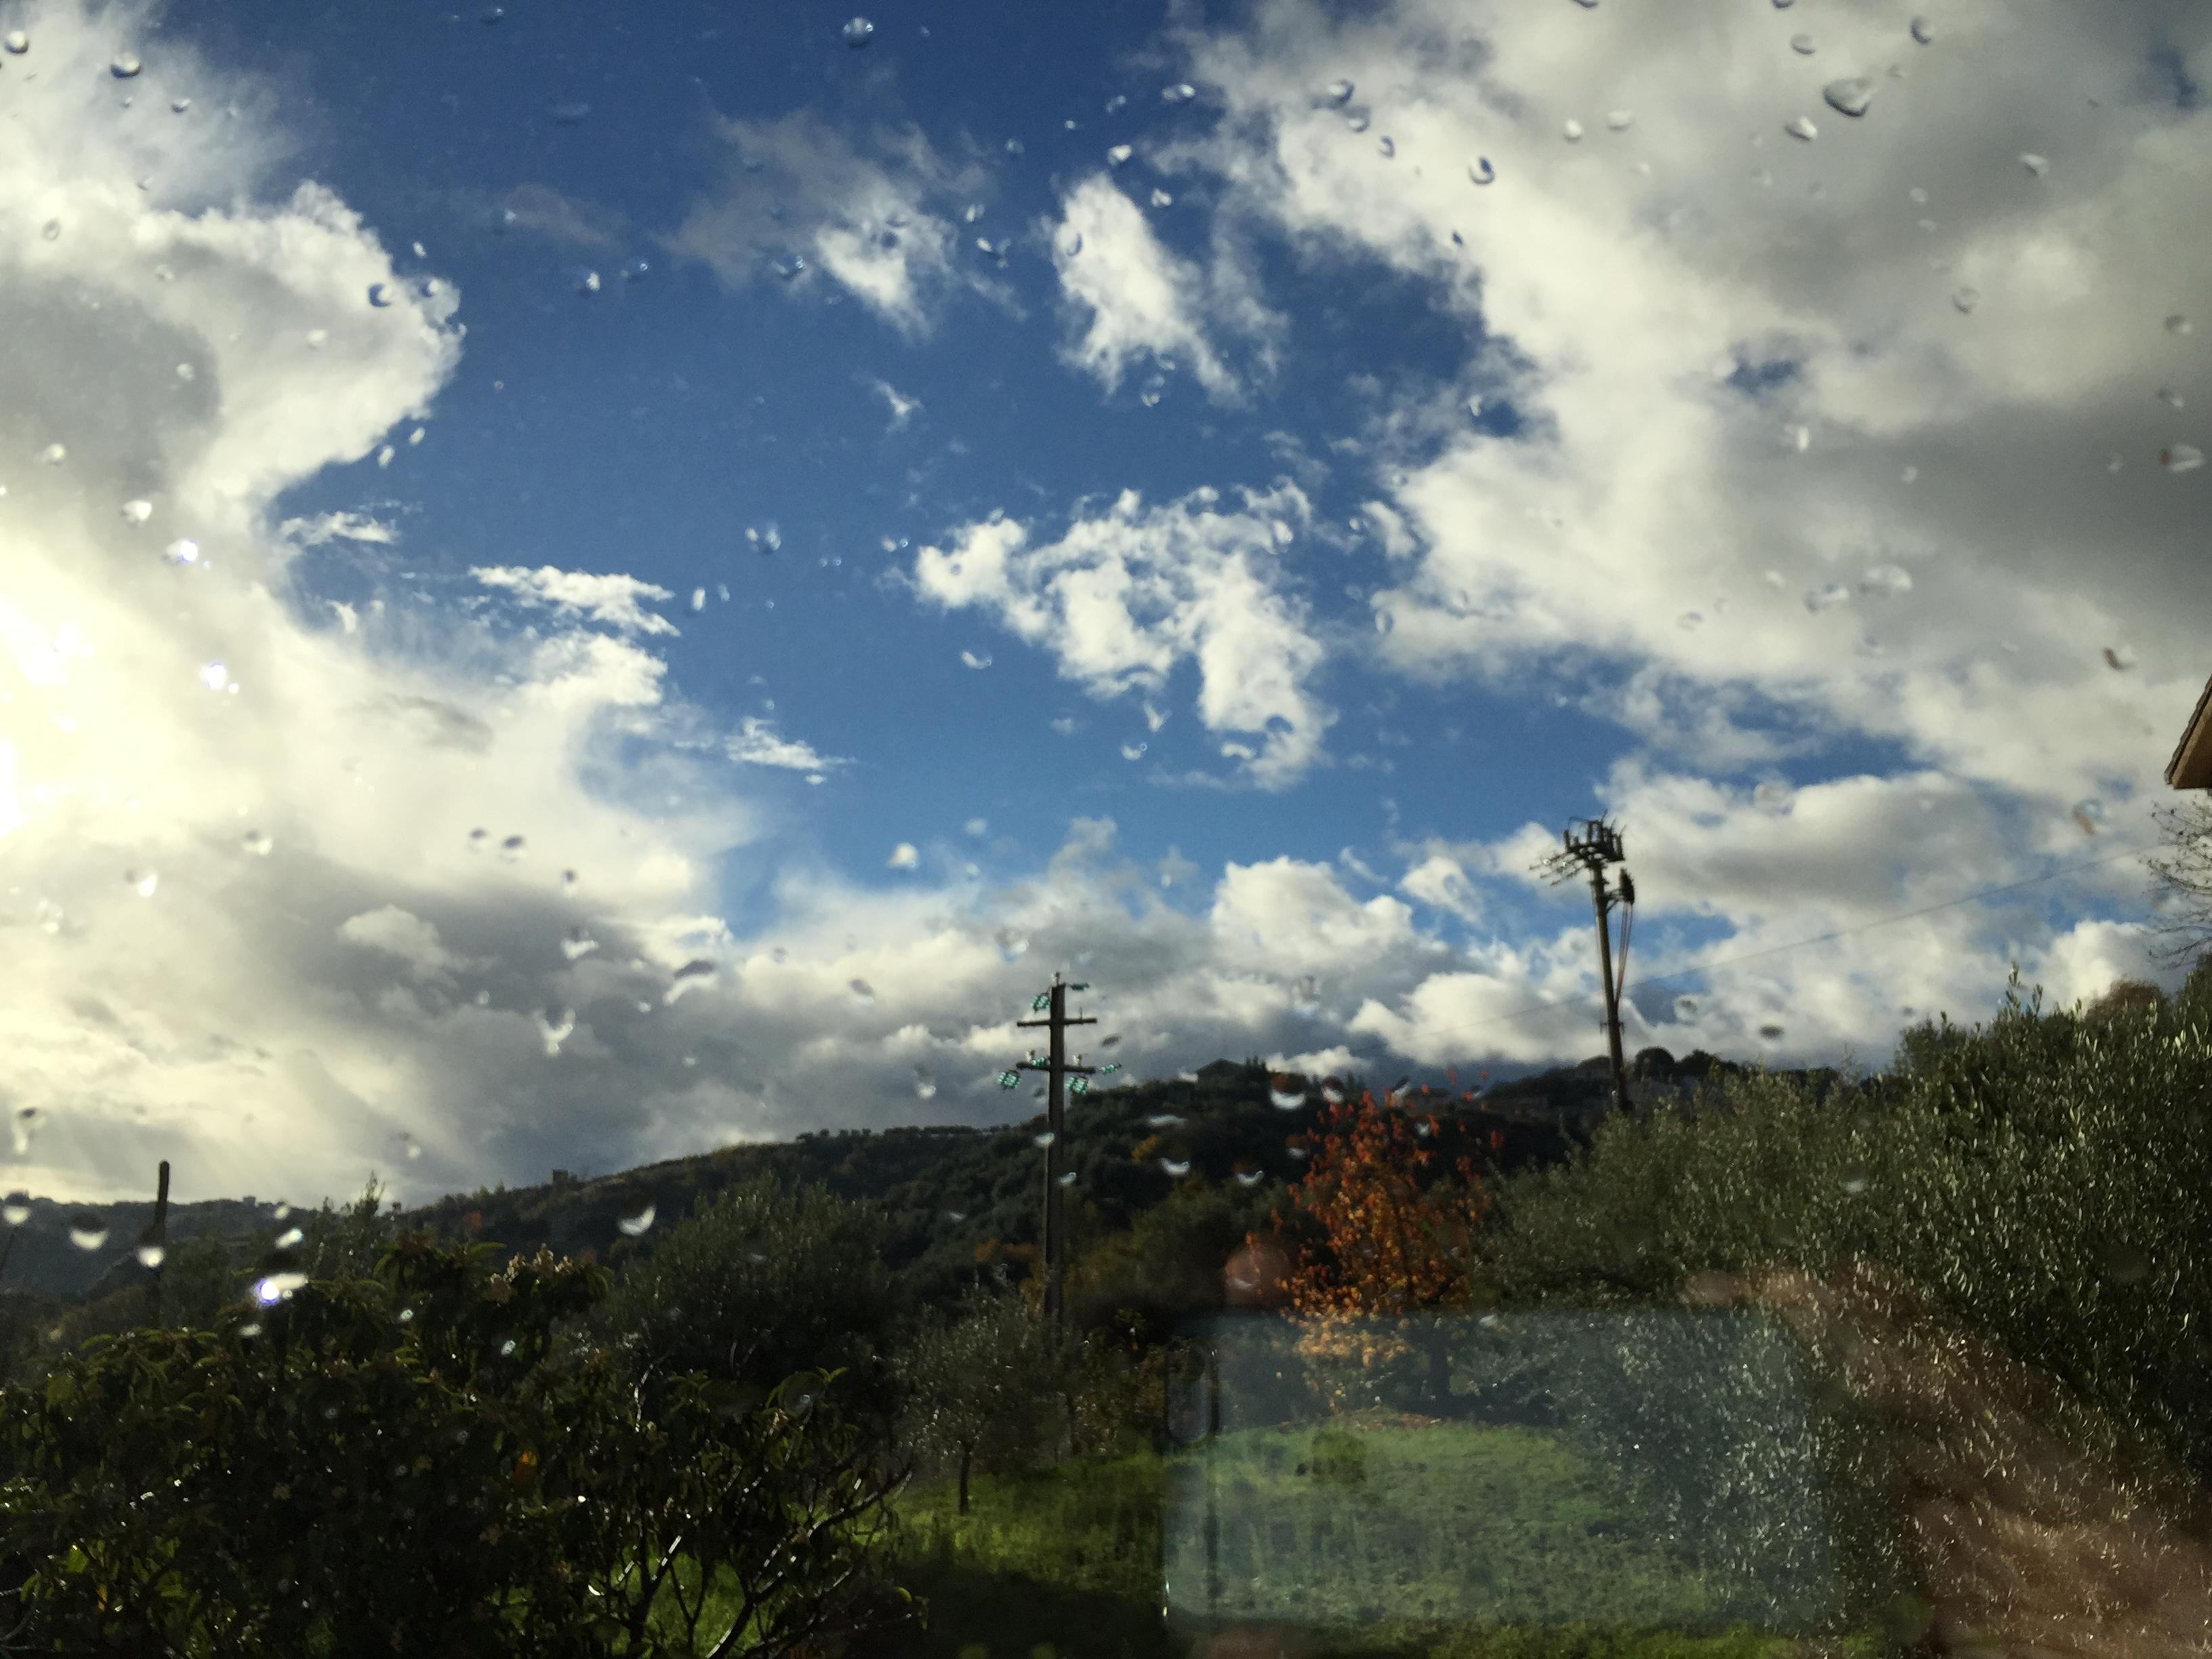 Residua instabilità, poi da lunedì bel tempo quasi ovunque....